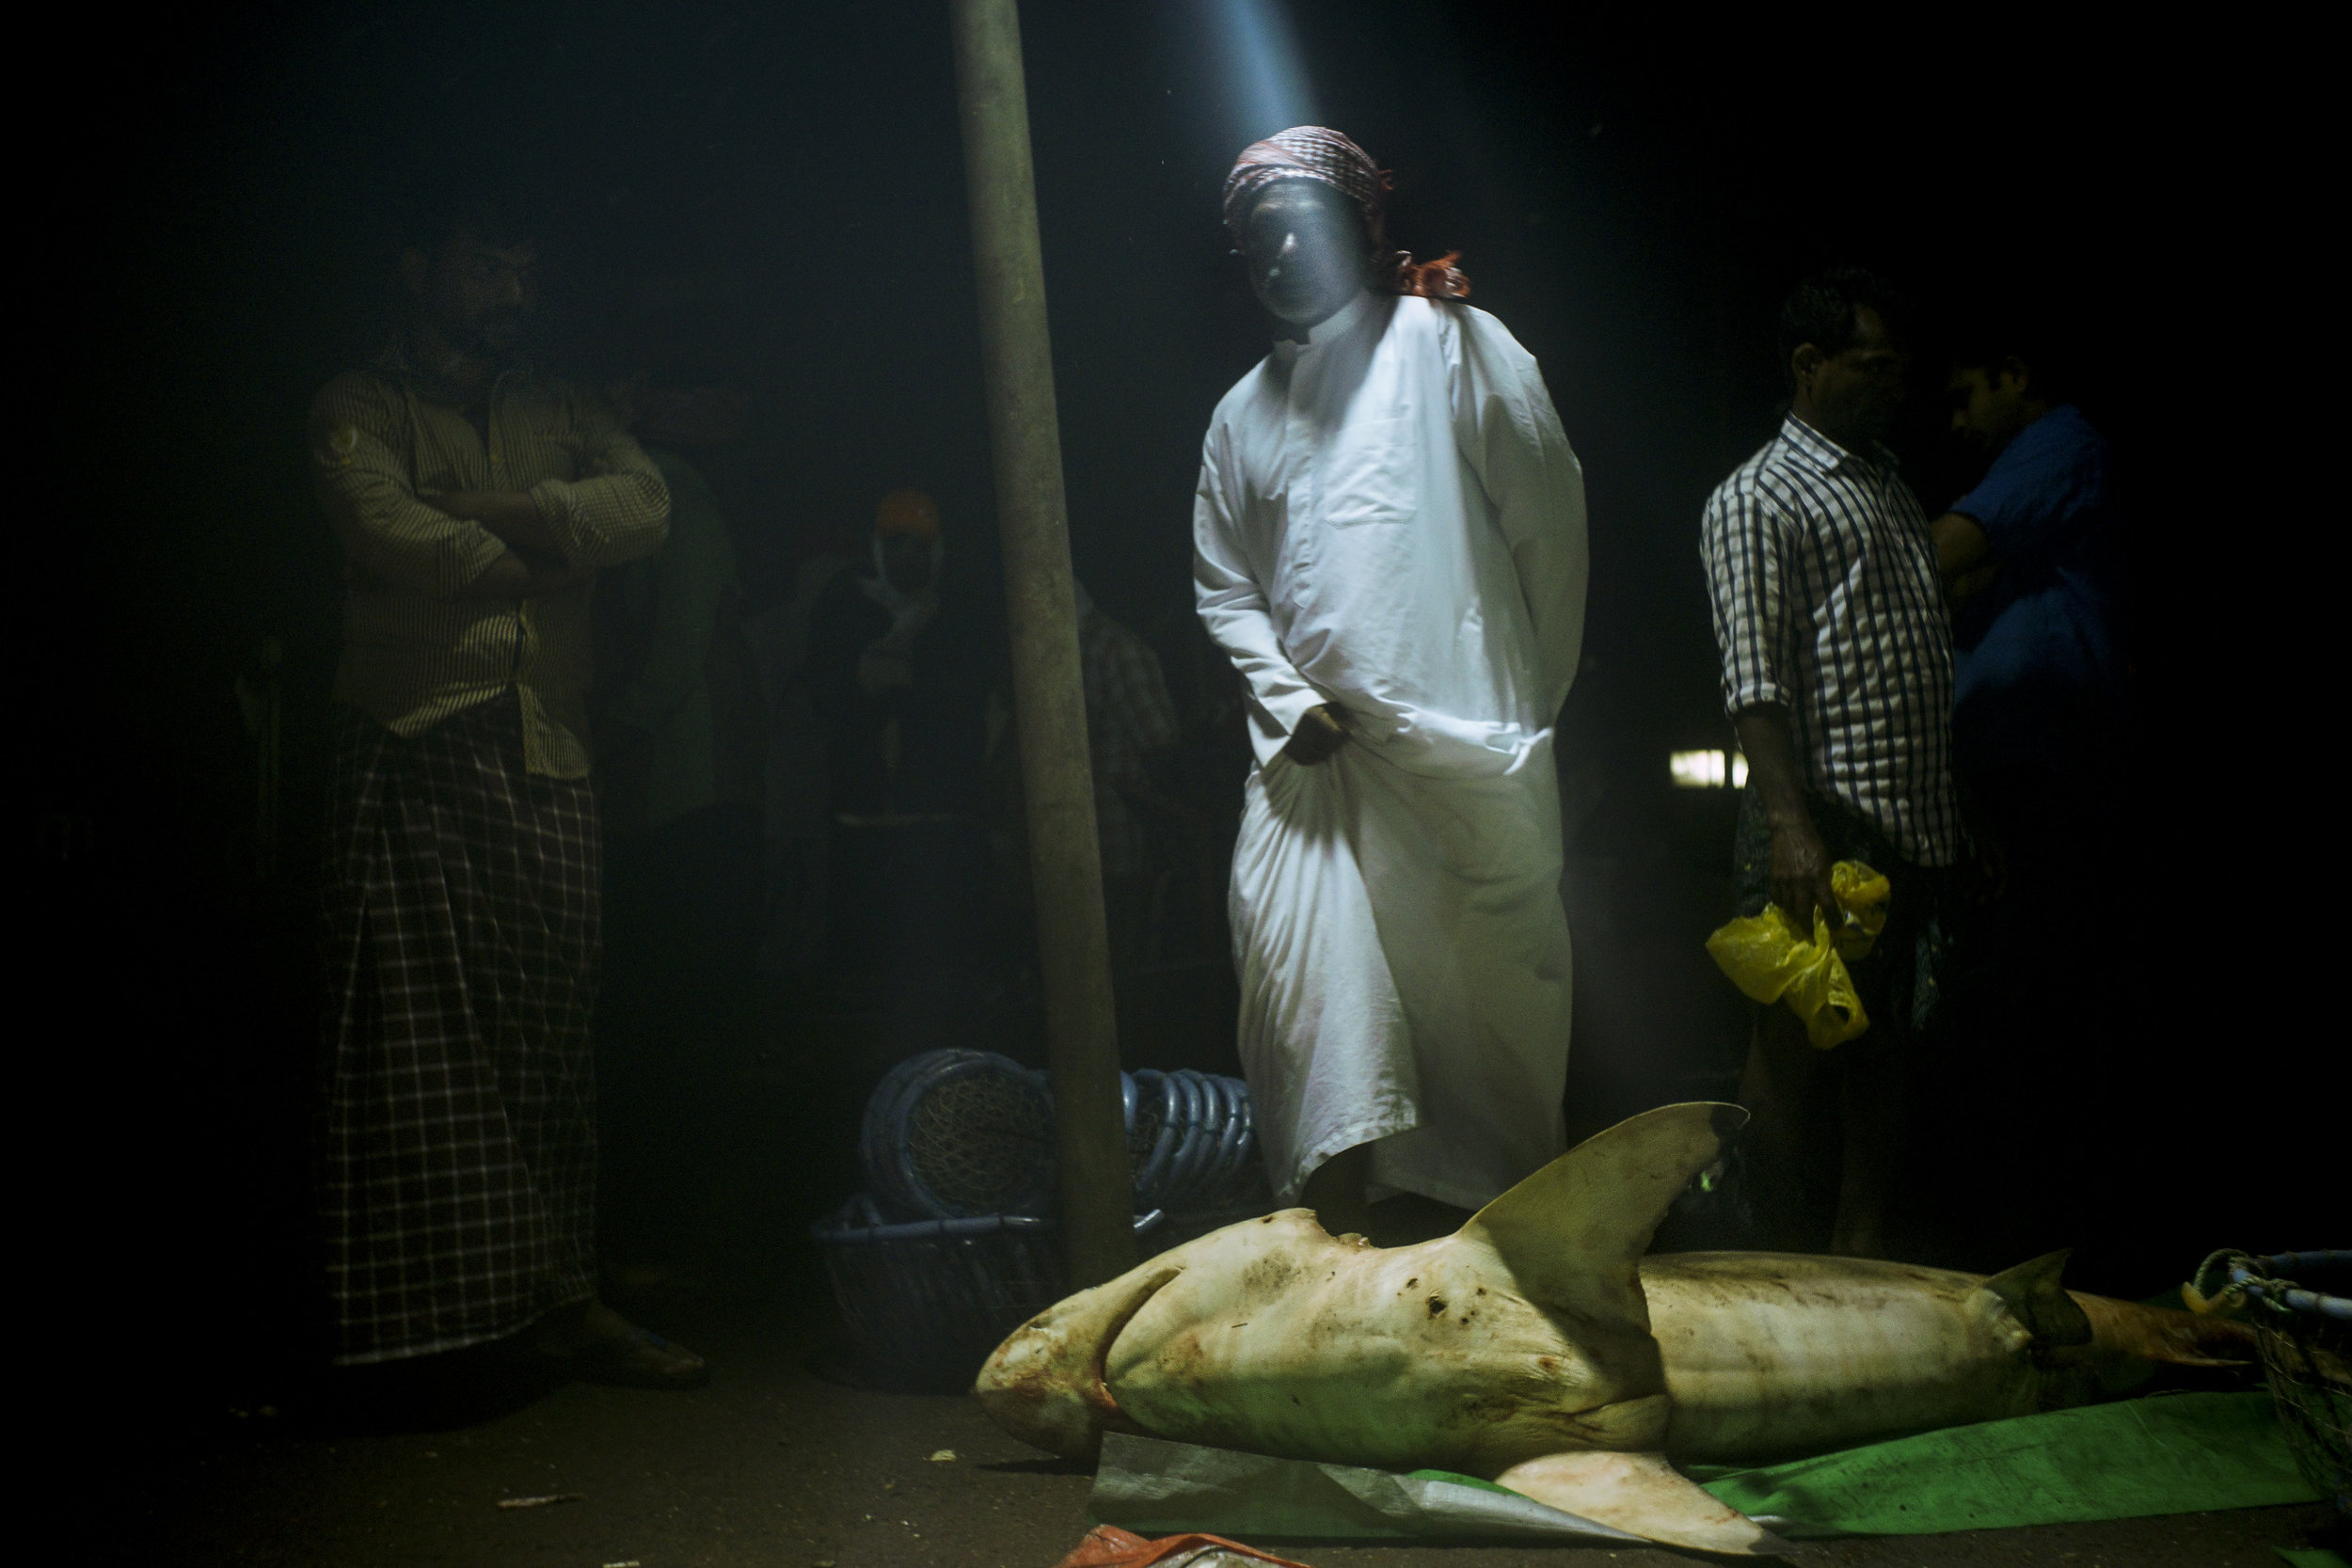 Photojournalism: Fishermen of Abu Dhabi